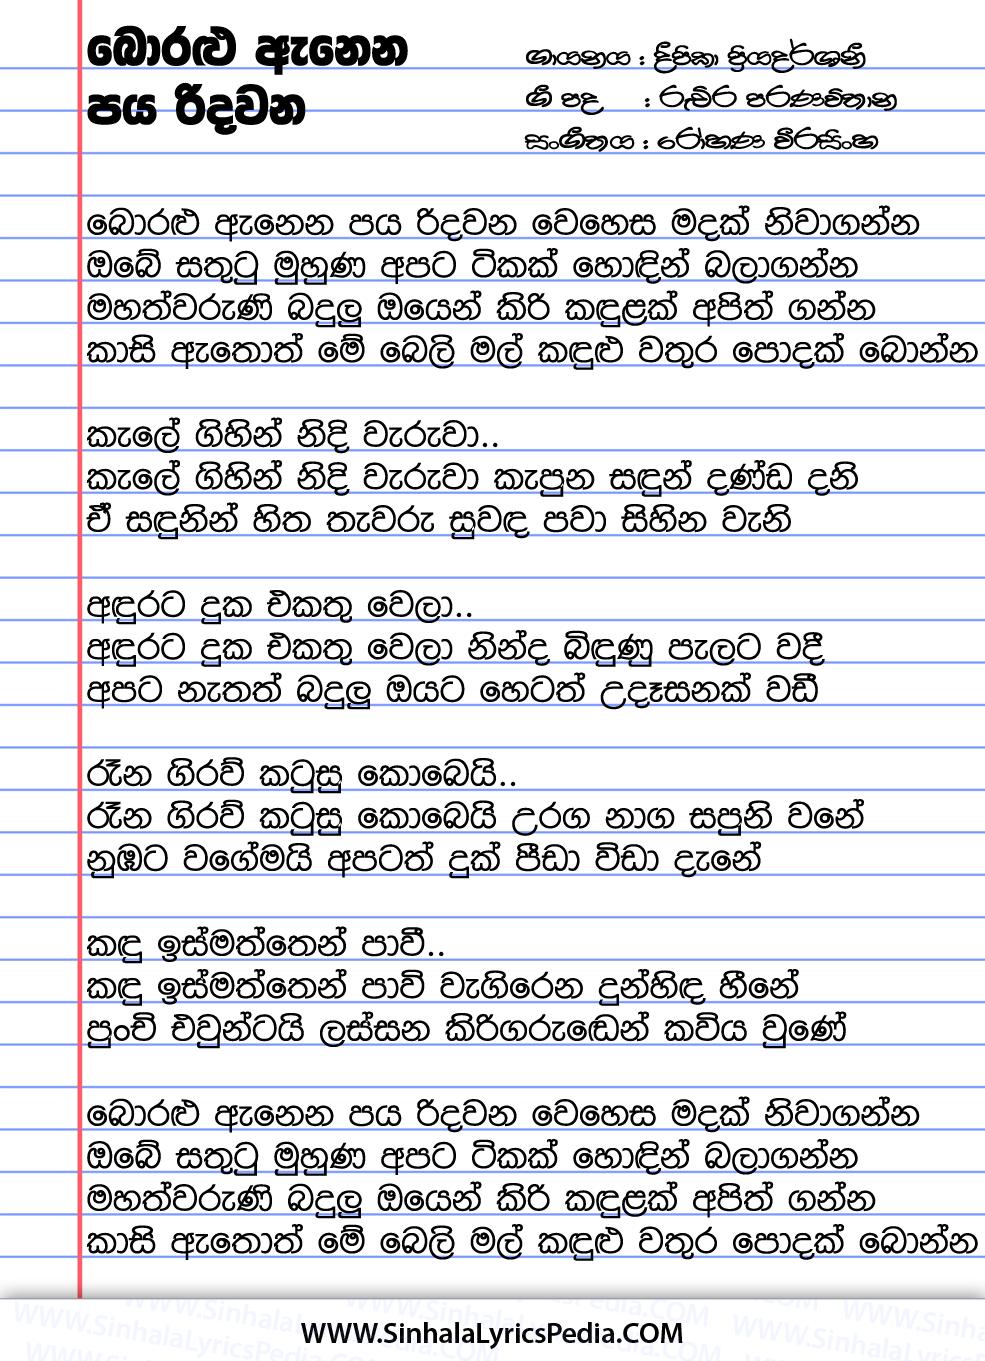 Boralu Anena Paya Ridawana Song Lyrics